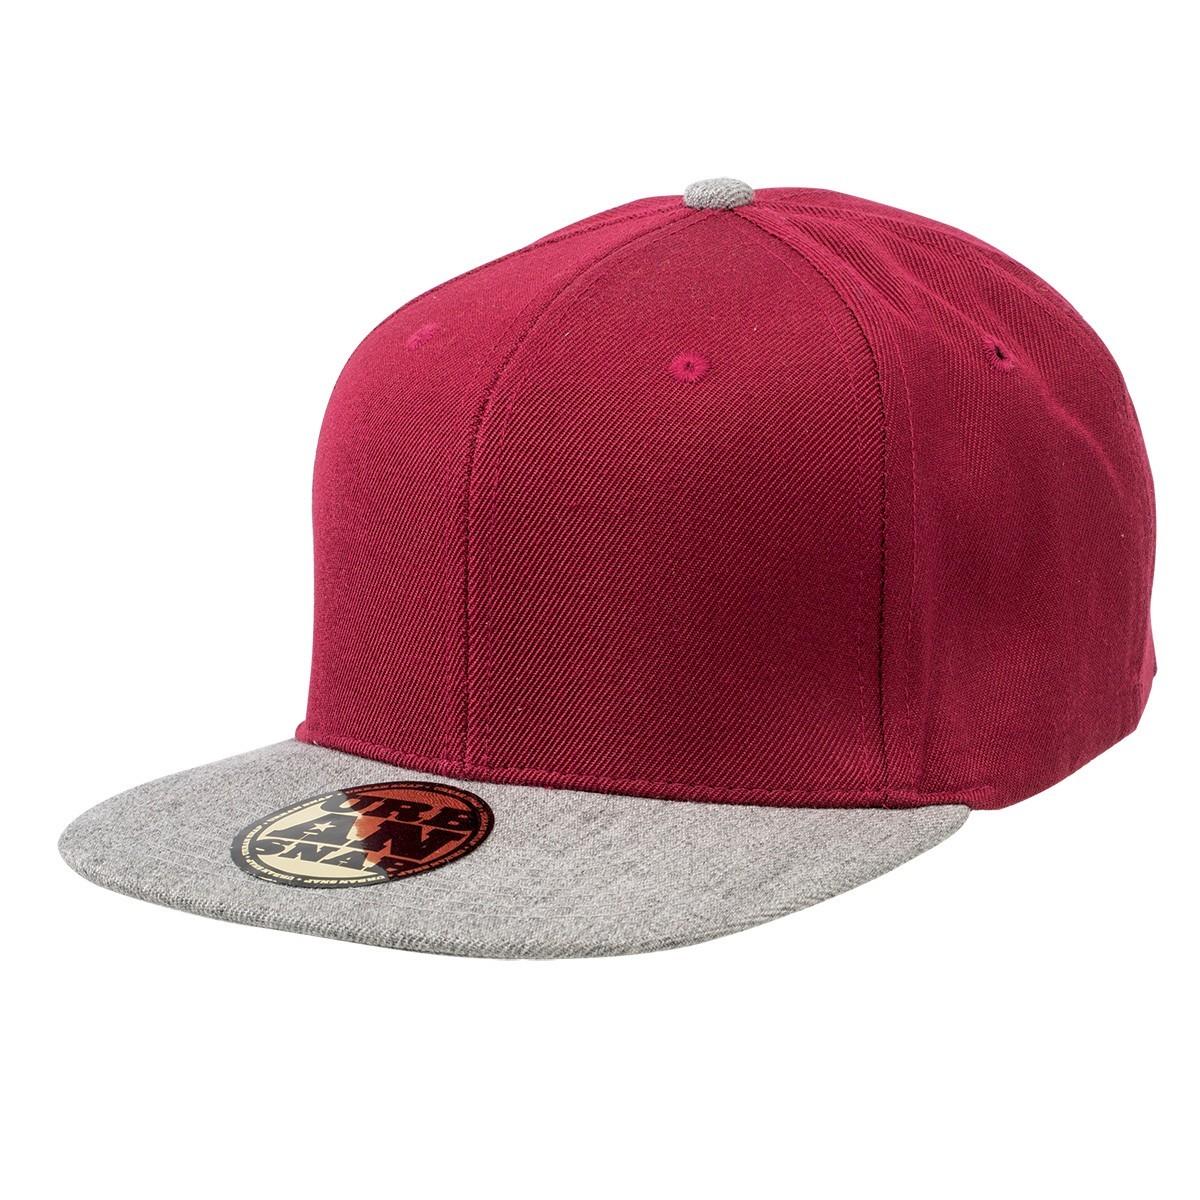 FREESTYLER SNAP CAP